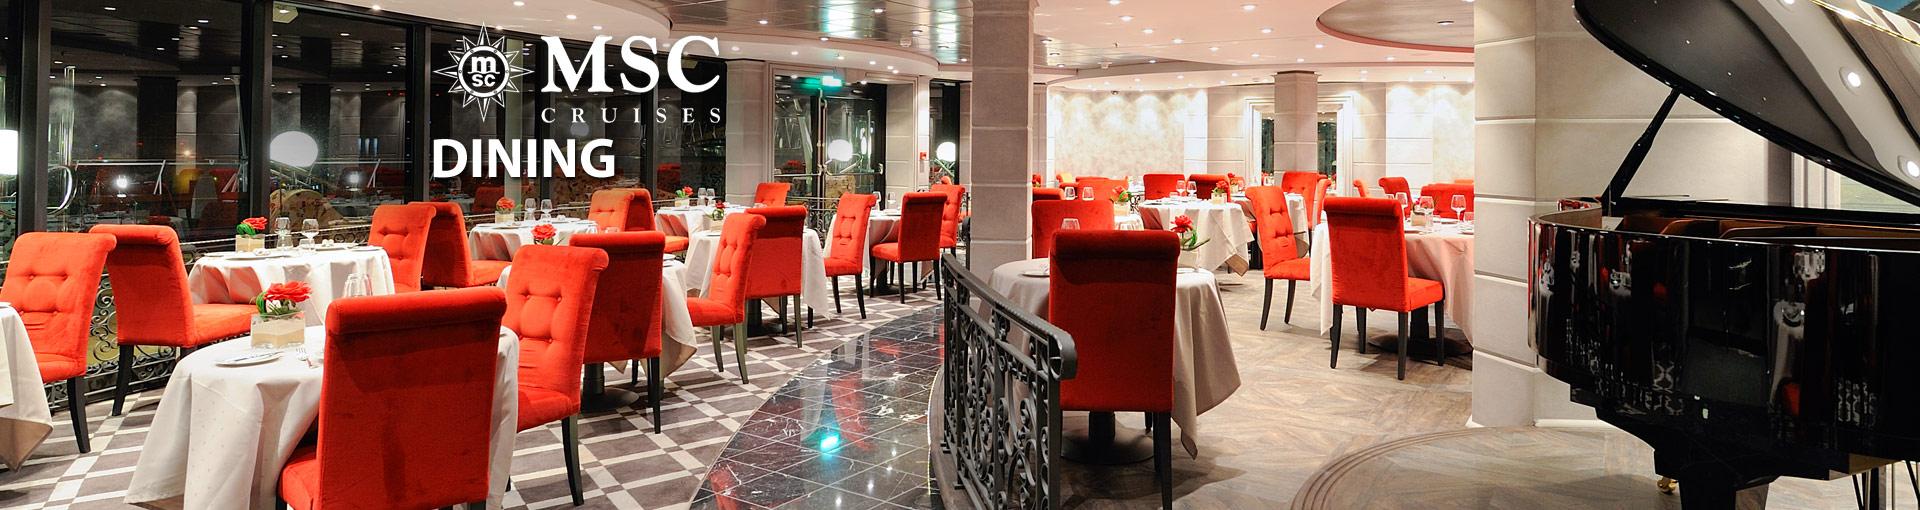 MSC Cruises Dining